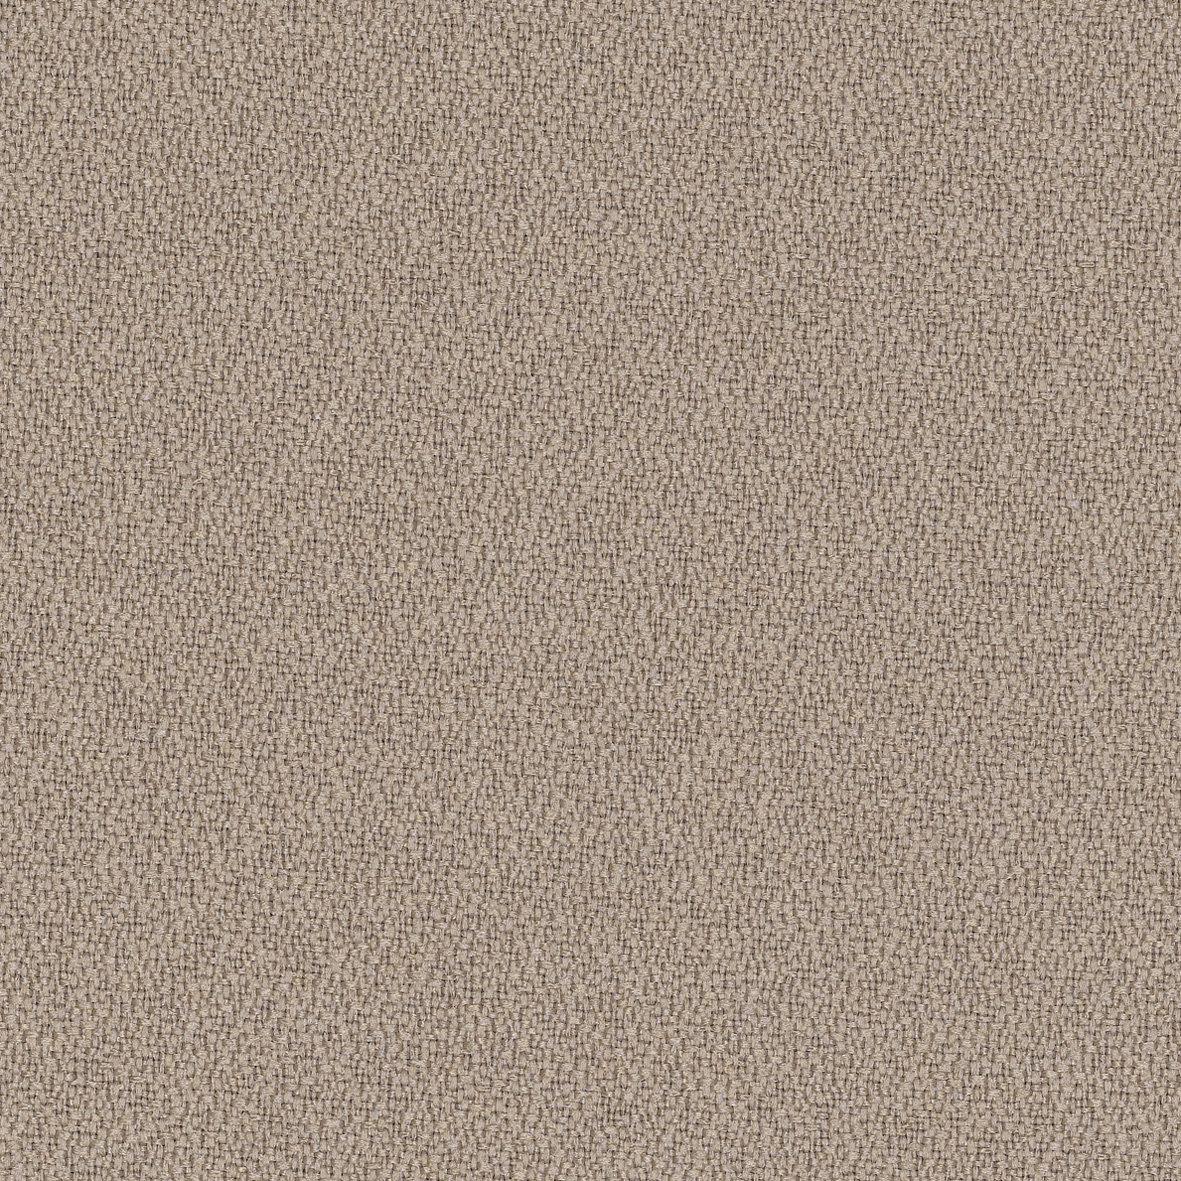 Softline bordskærmvæg beige B1200xH590 mm